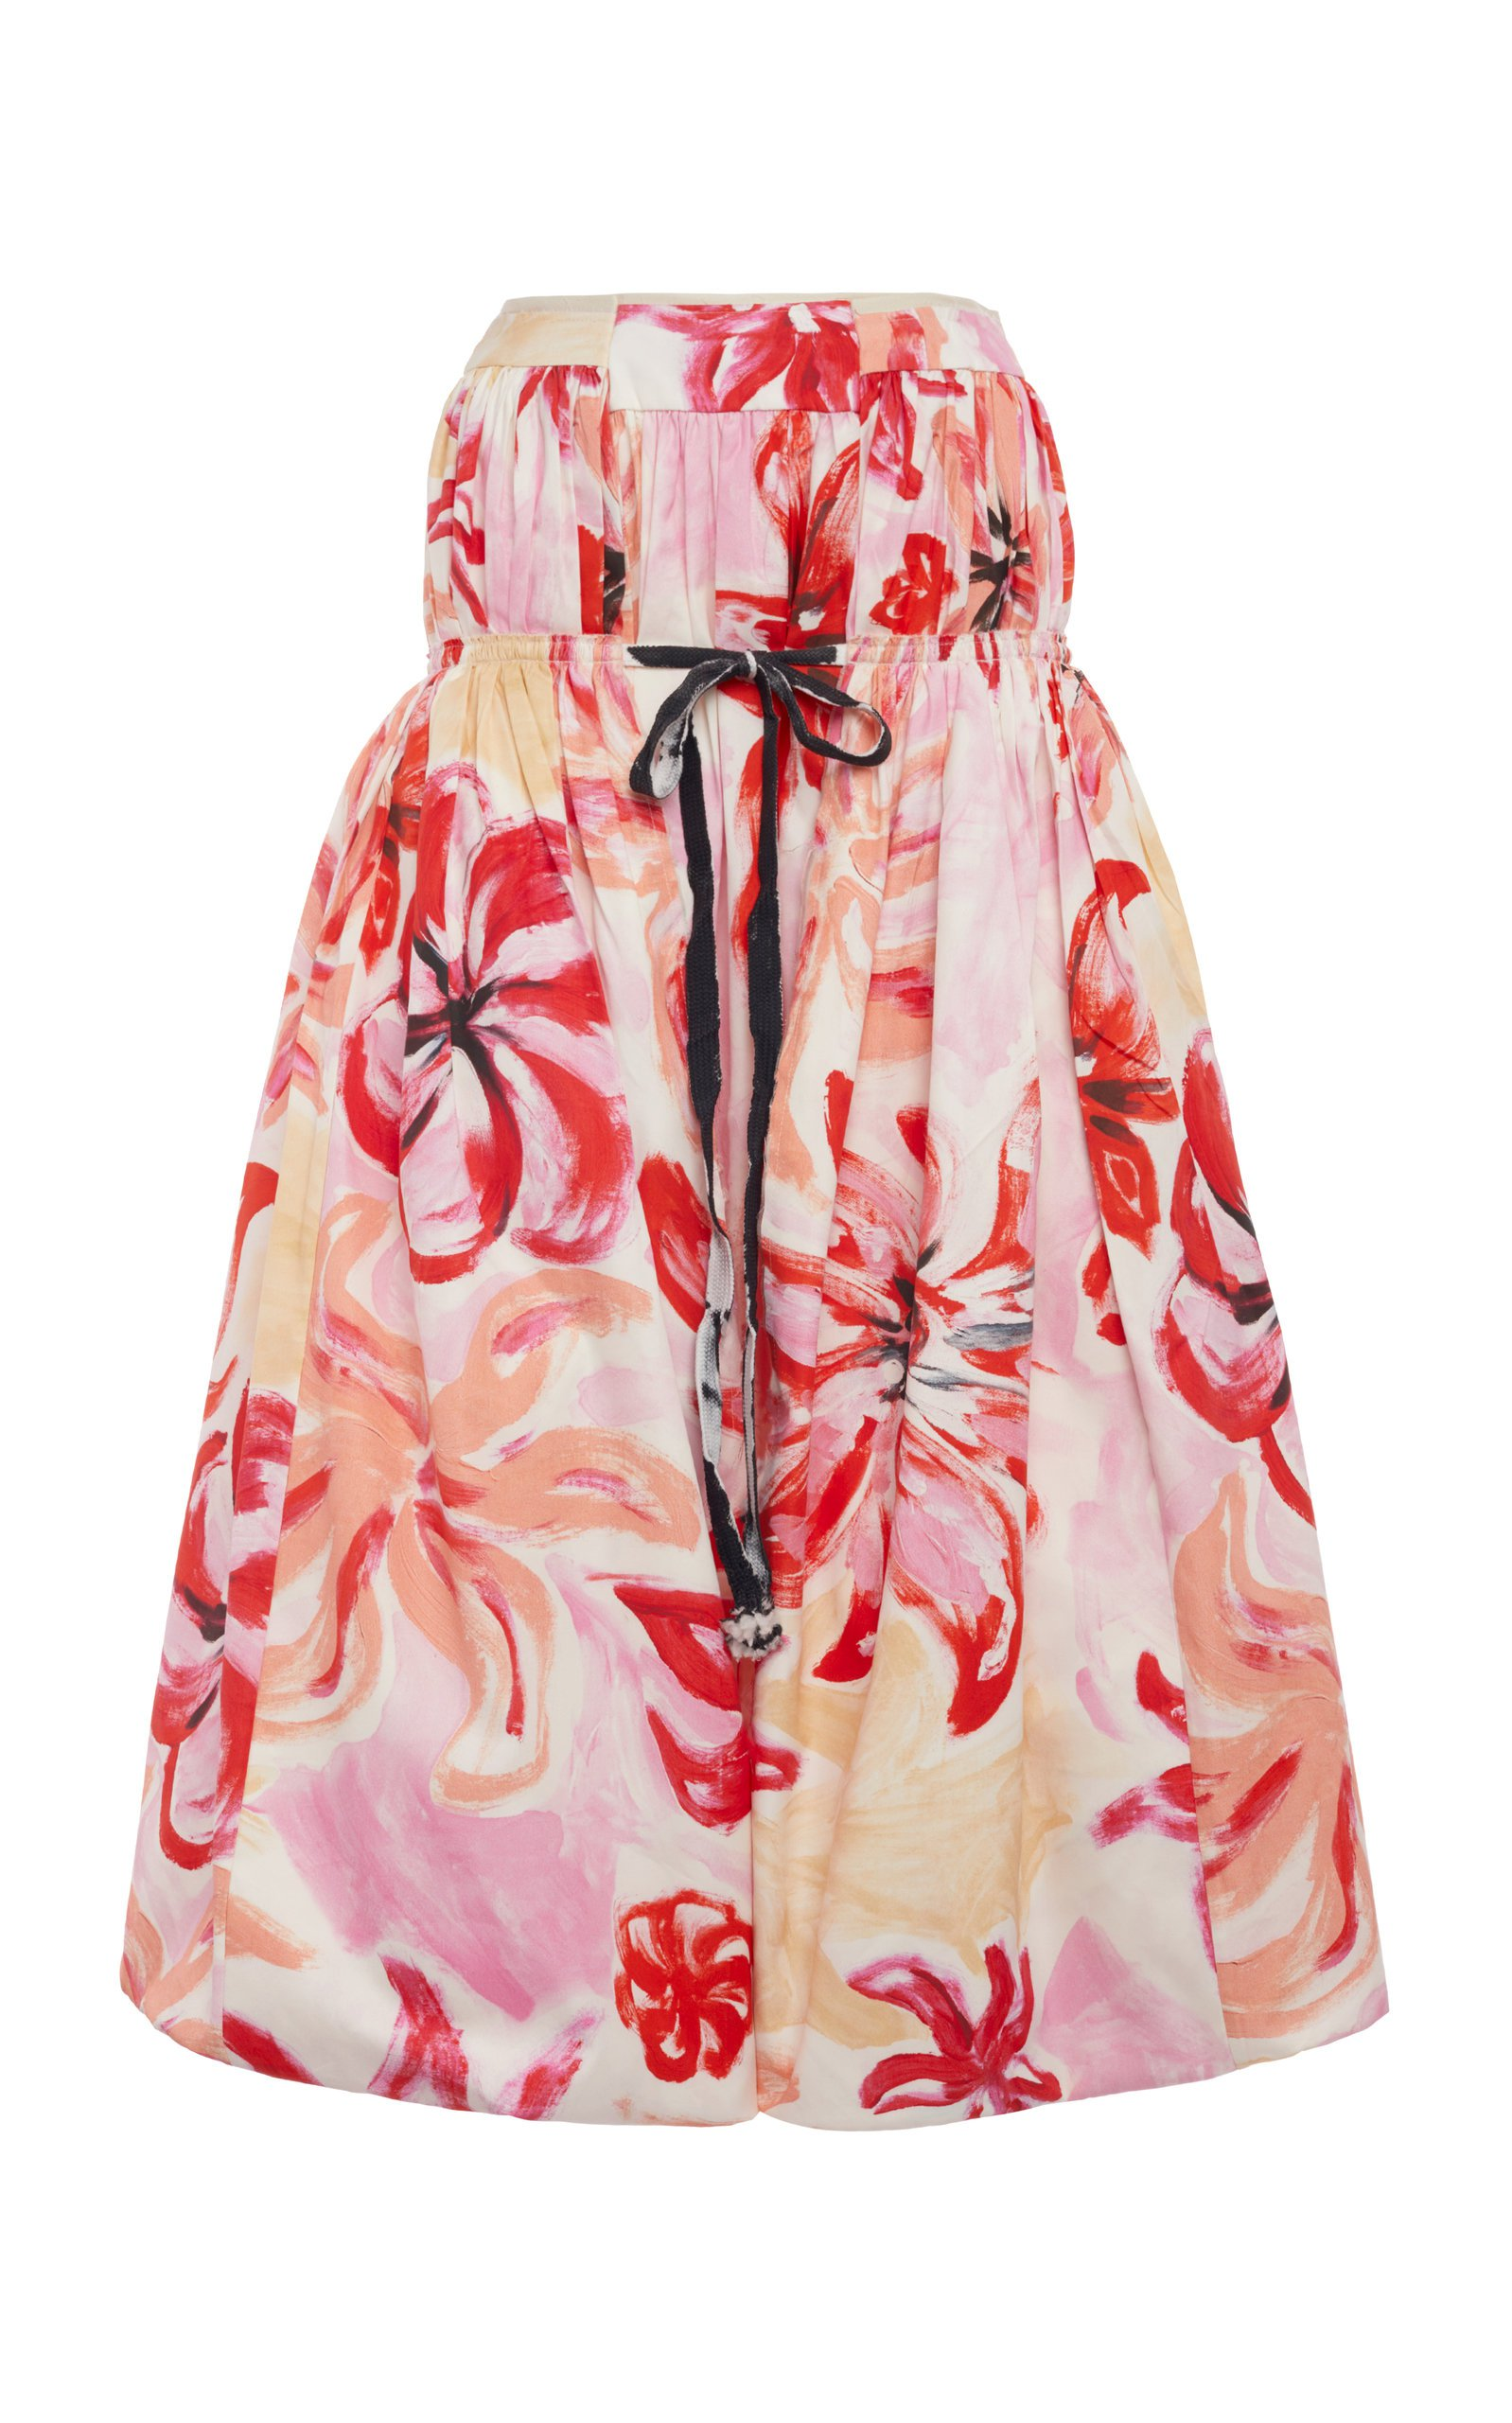 Marni Floral-Print Cotton-Silk Midi Skirt Size: 40